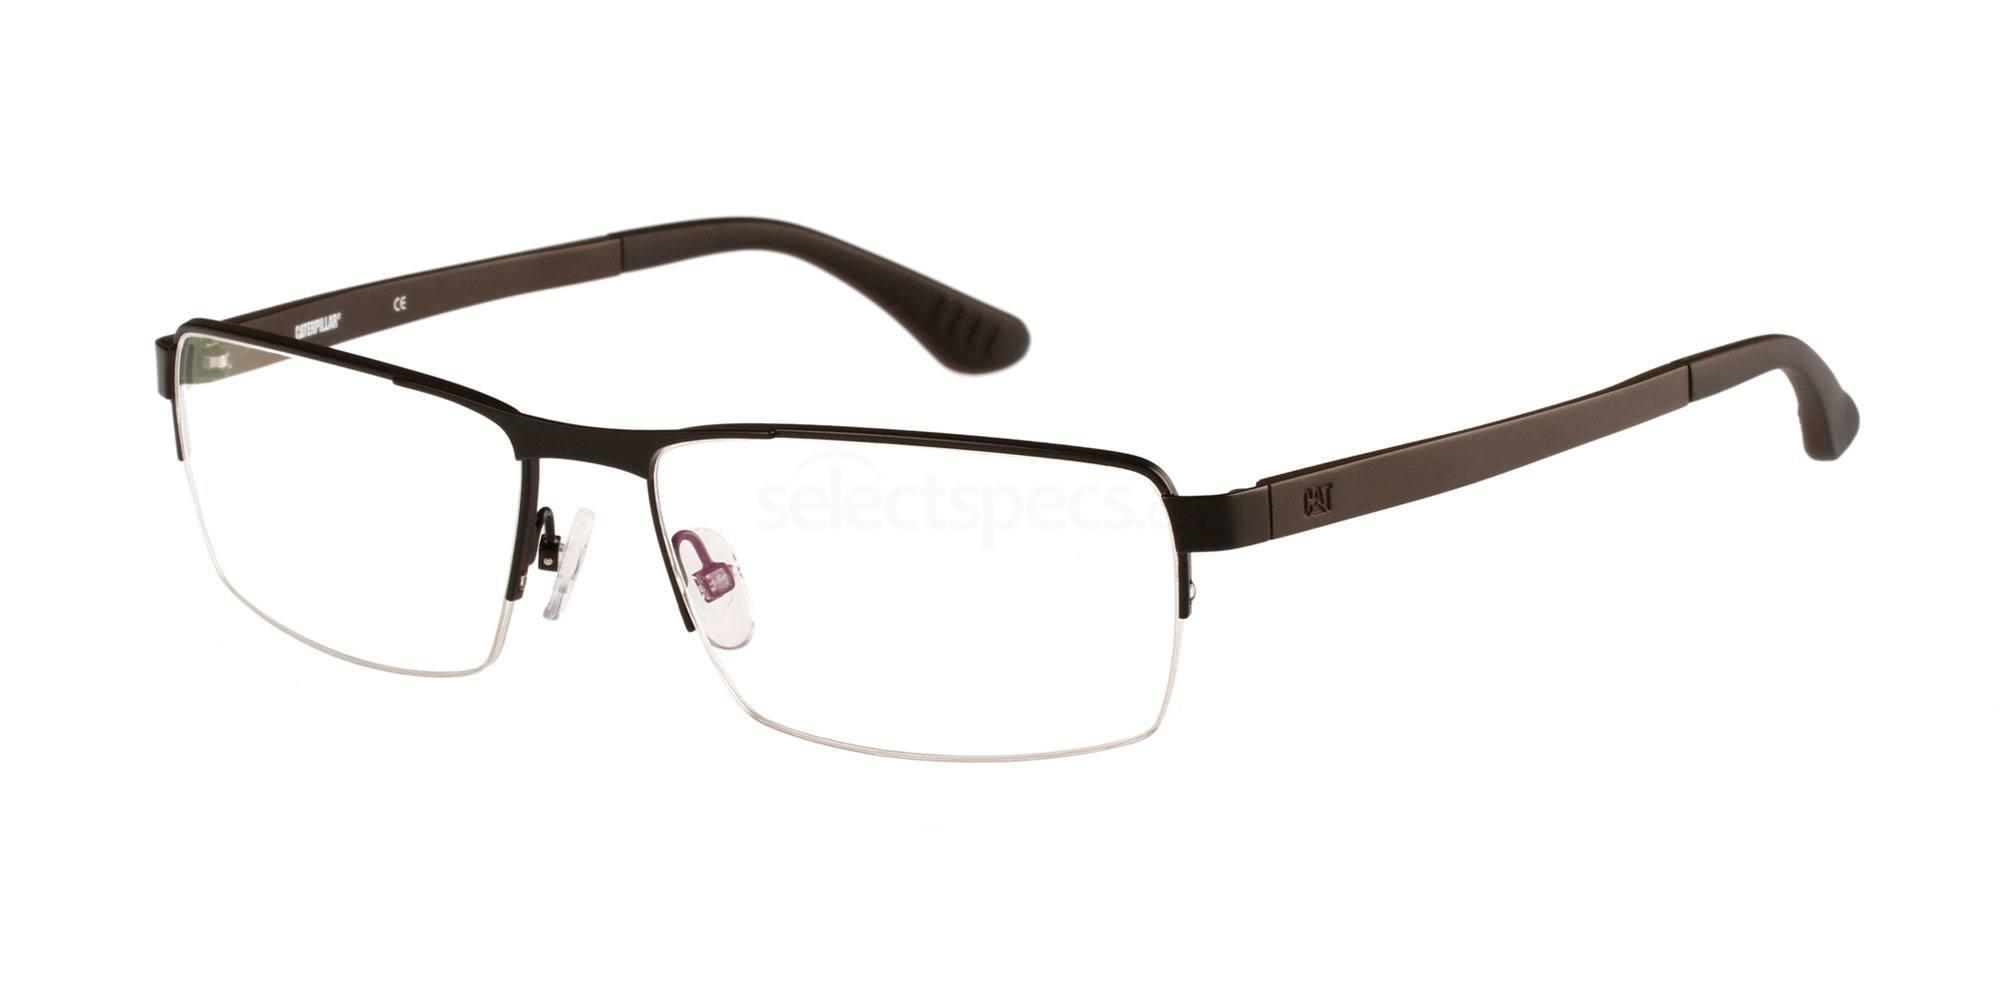 004 CTO J08 Glasses, CAT